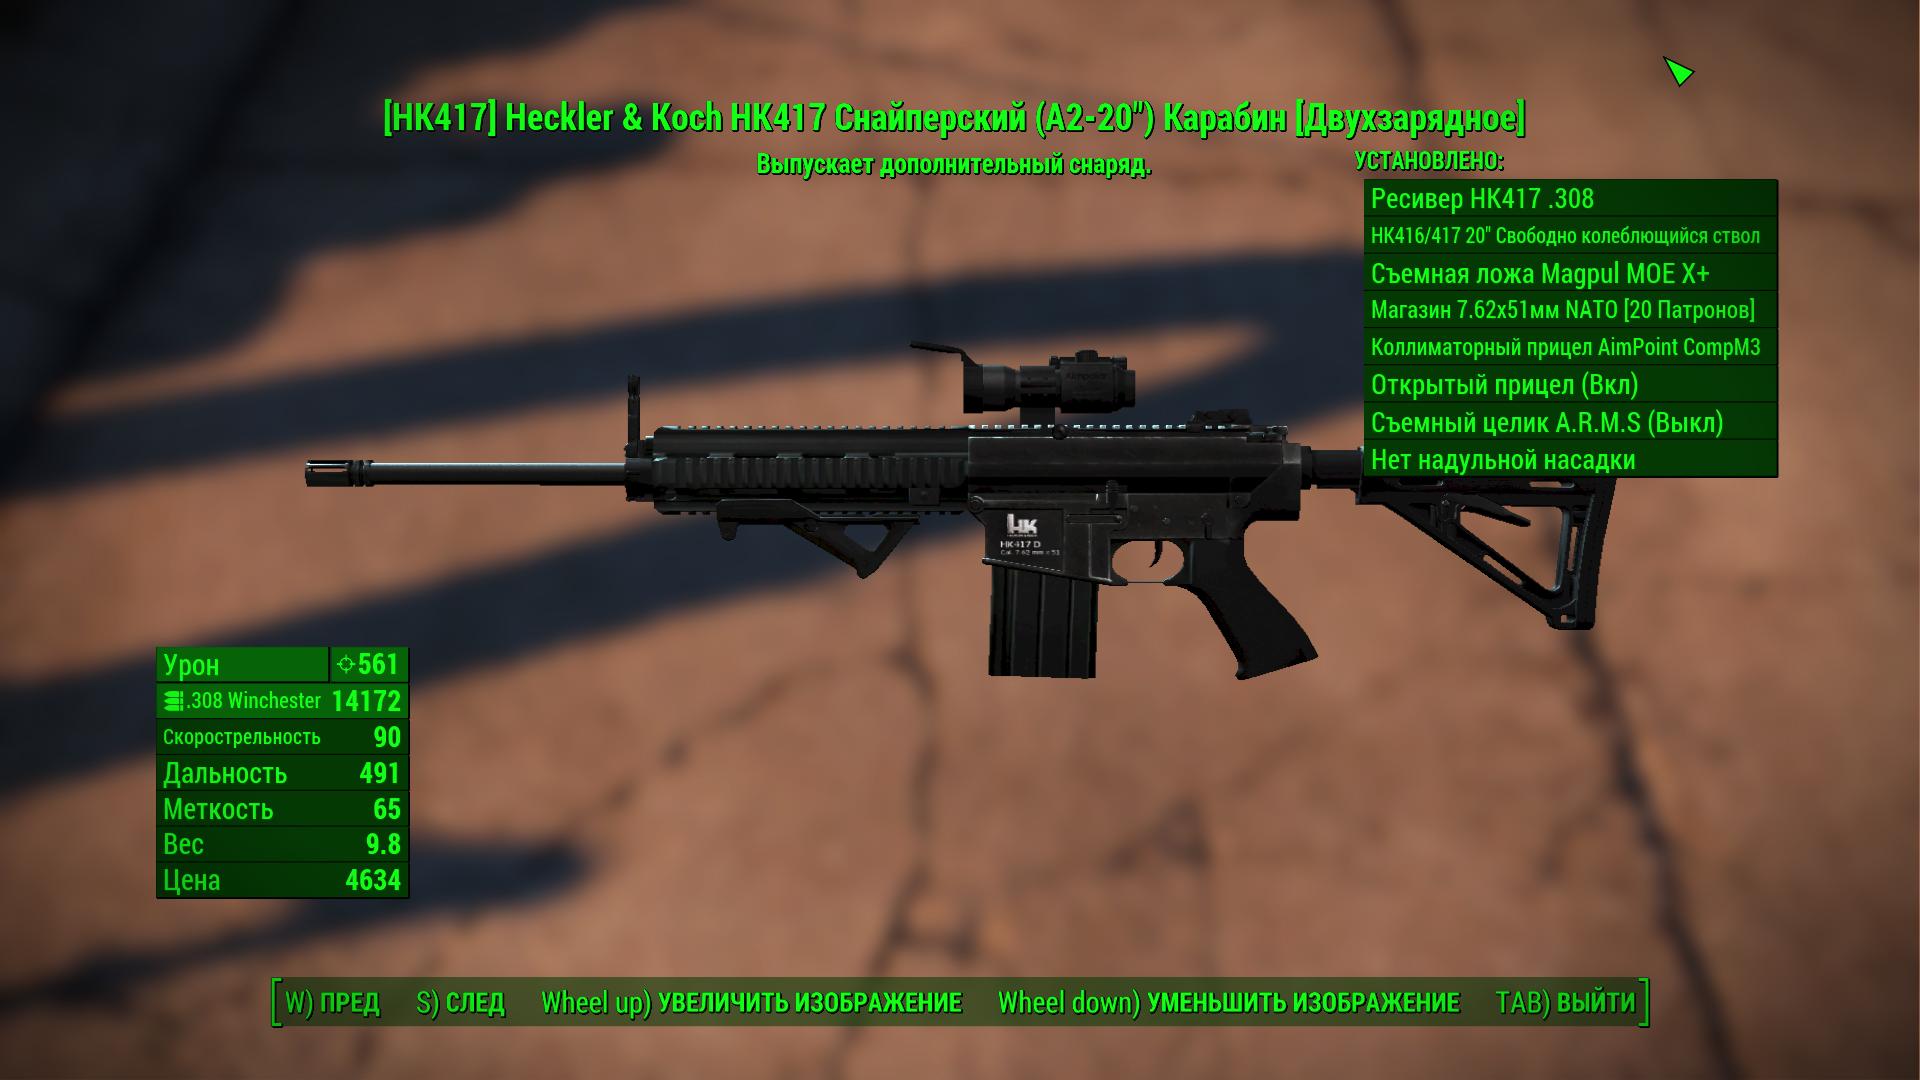 Убойная вещь от сверчка в ядер-мире) - Fallout 4